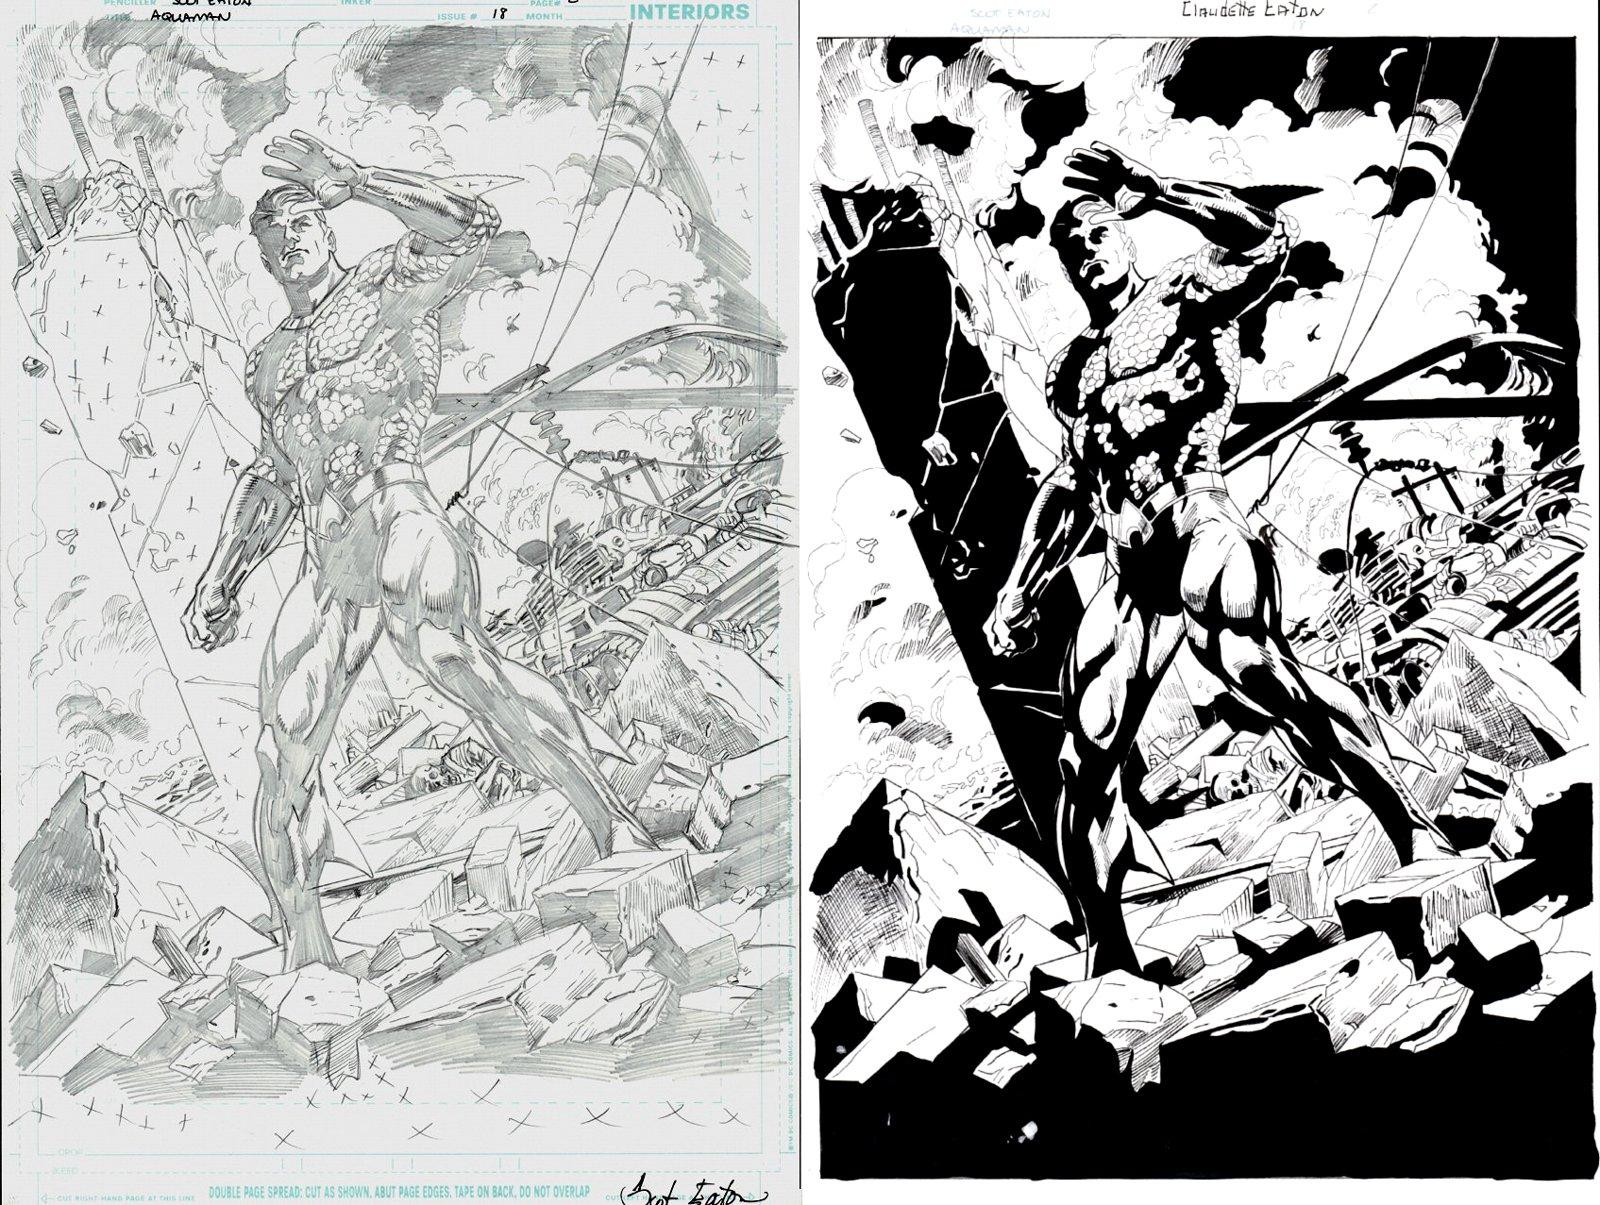 Aquaman #18 p 2 SPLASH Penciled Splash & Separate Inked Splash(2017)